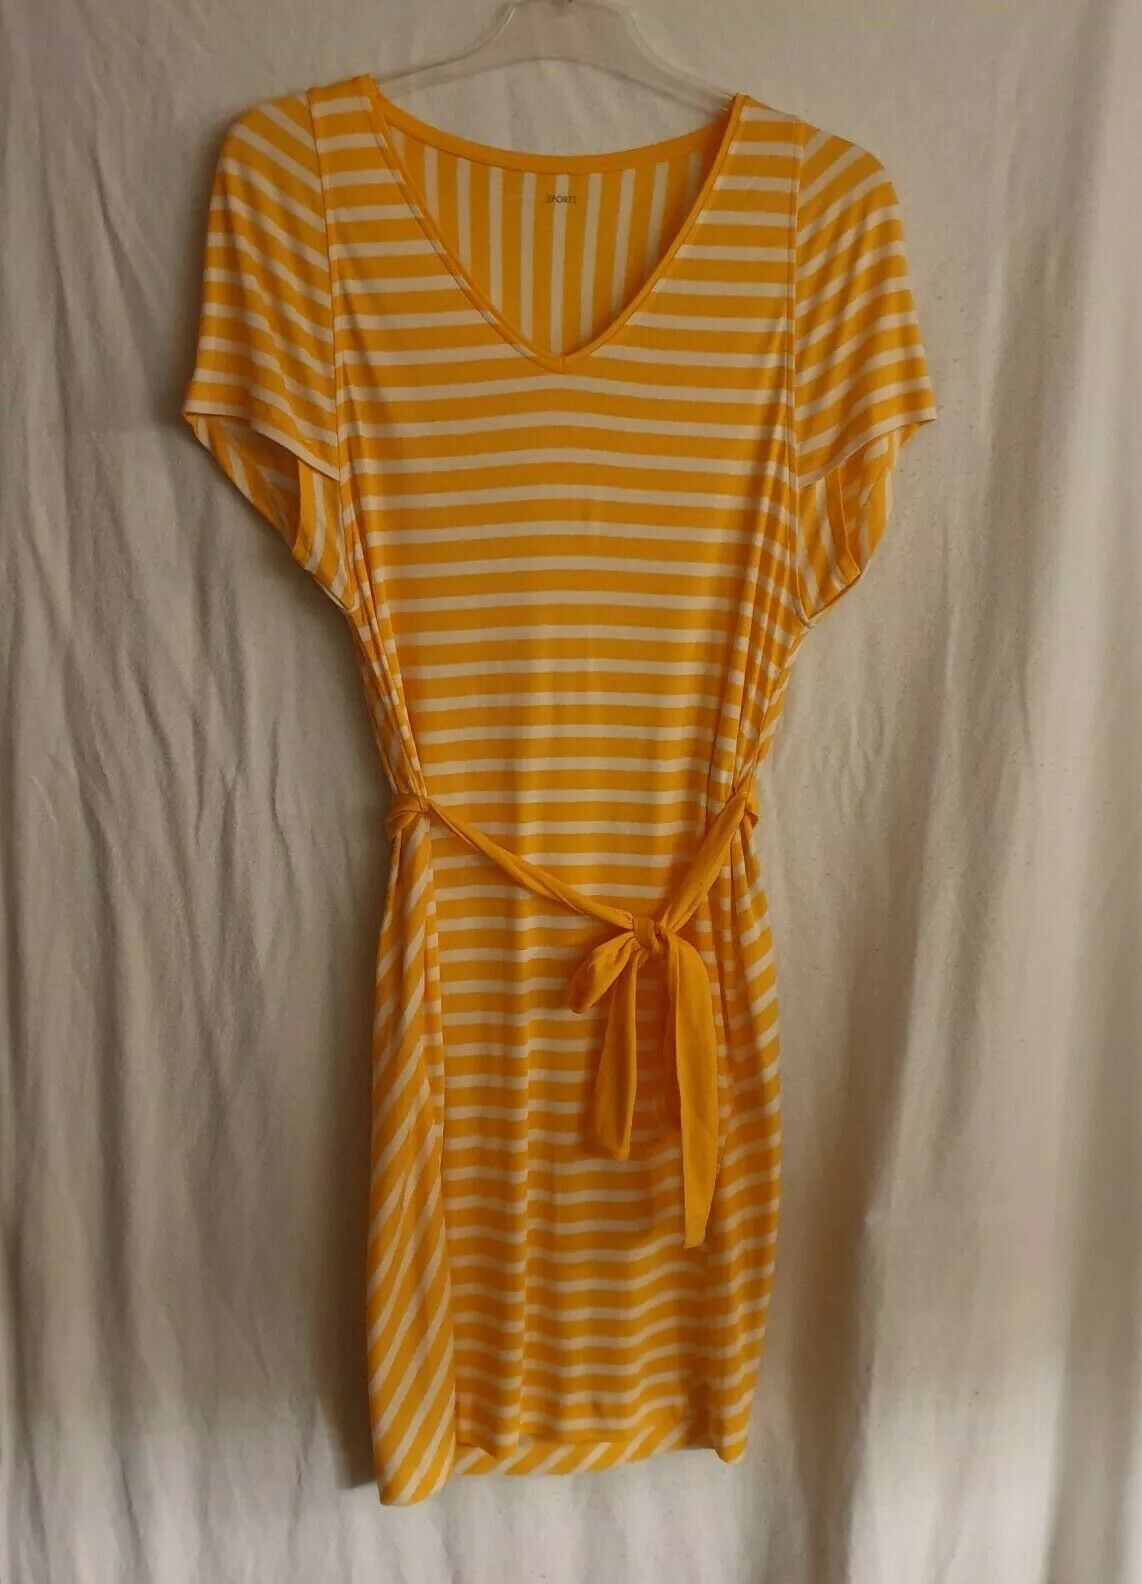 Marc Cain Minikleid   T-Hemd-Kleid Orange Weiß Gestreift Gr. N3  Gr. 38